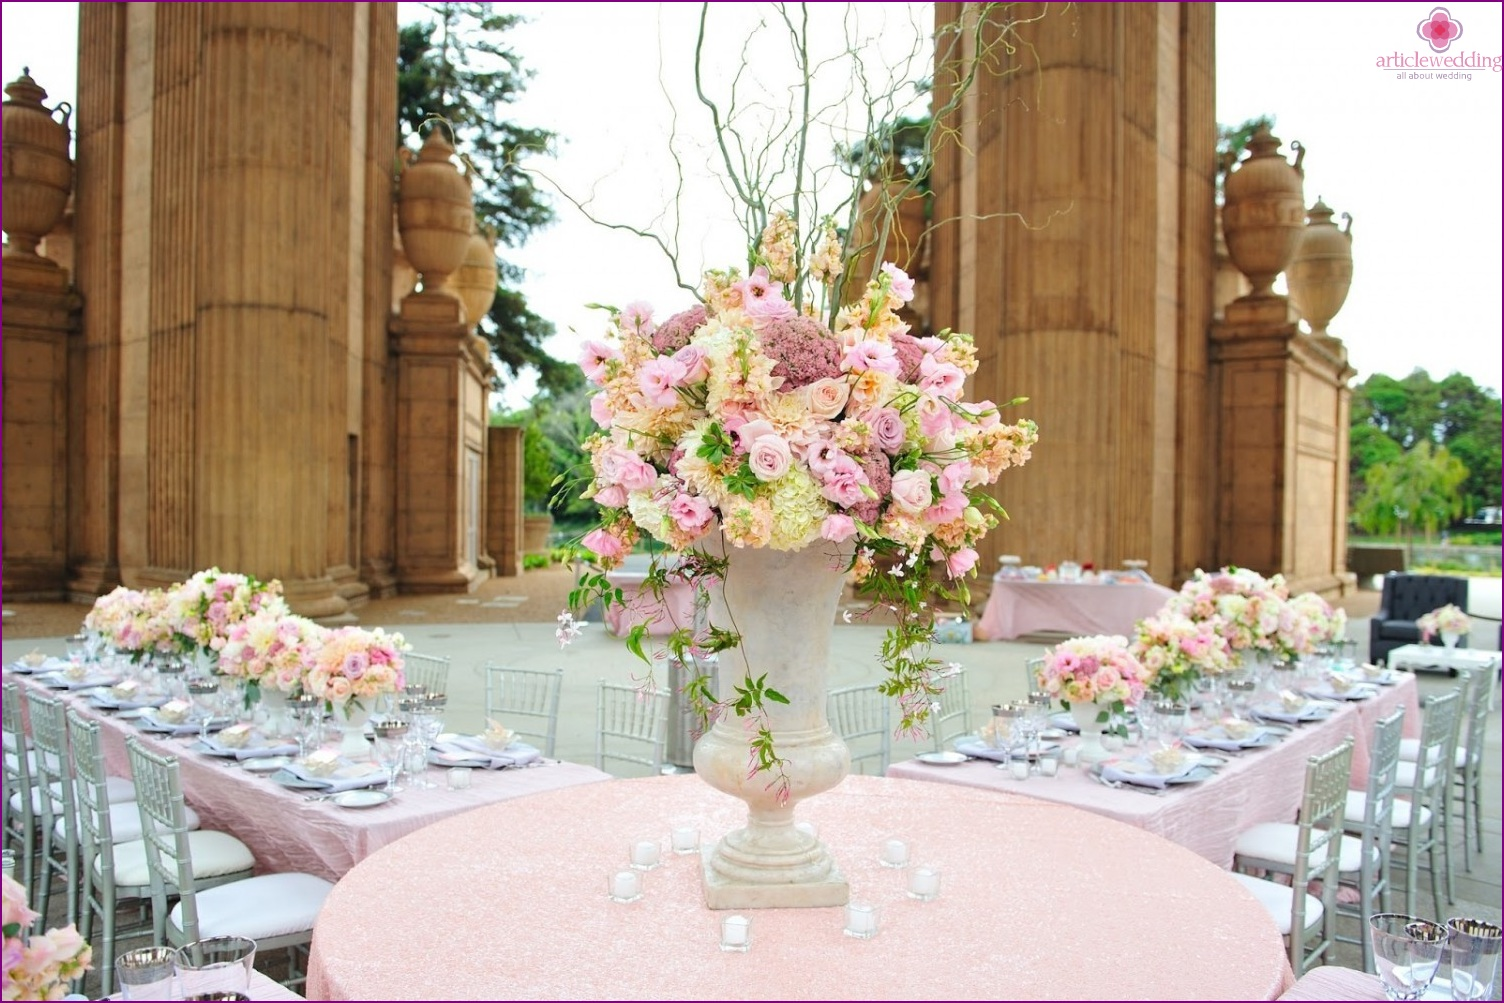 Wedding in pastel colors